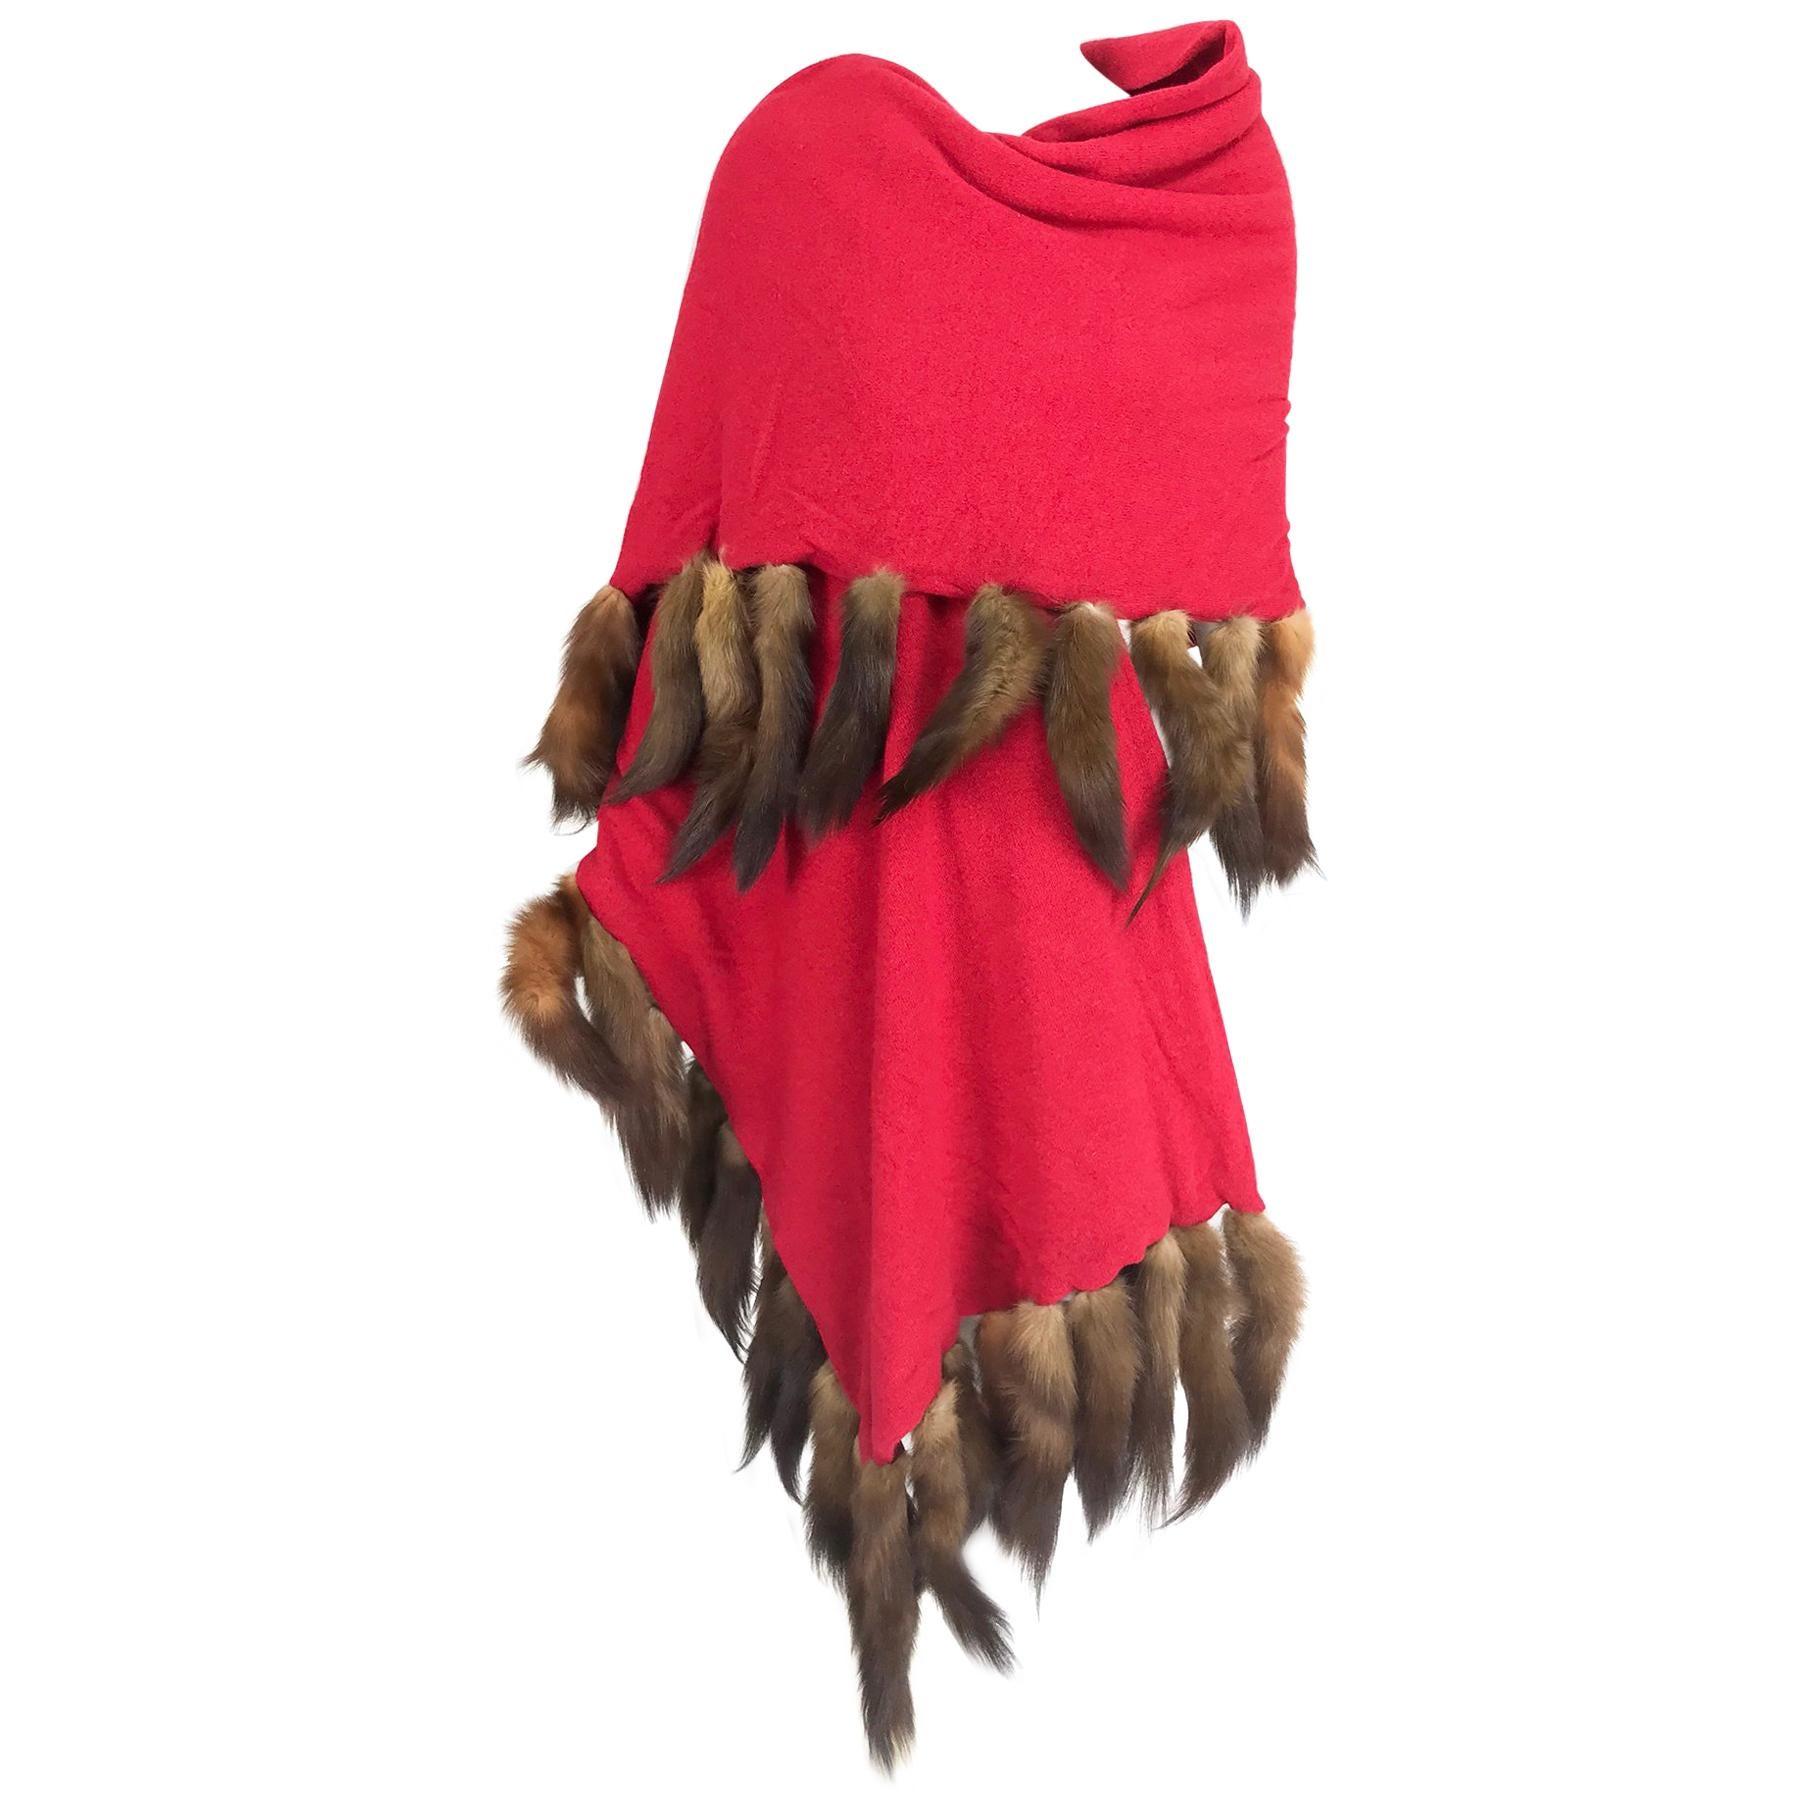 Adrienne Landau Red Wool Knit shawl with mink tail trim 1980s